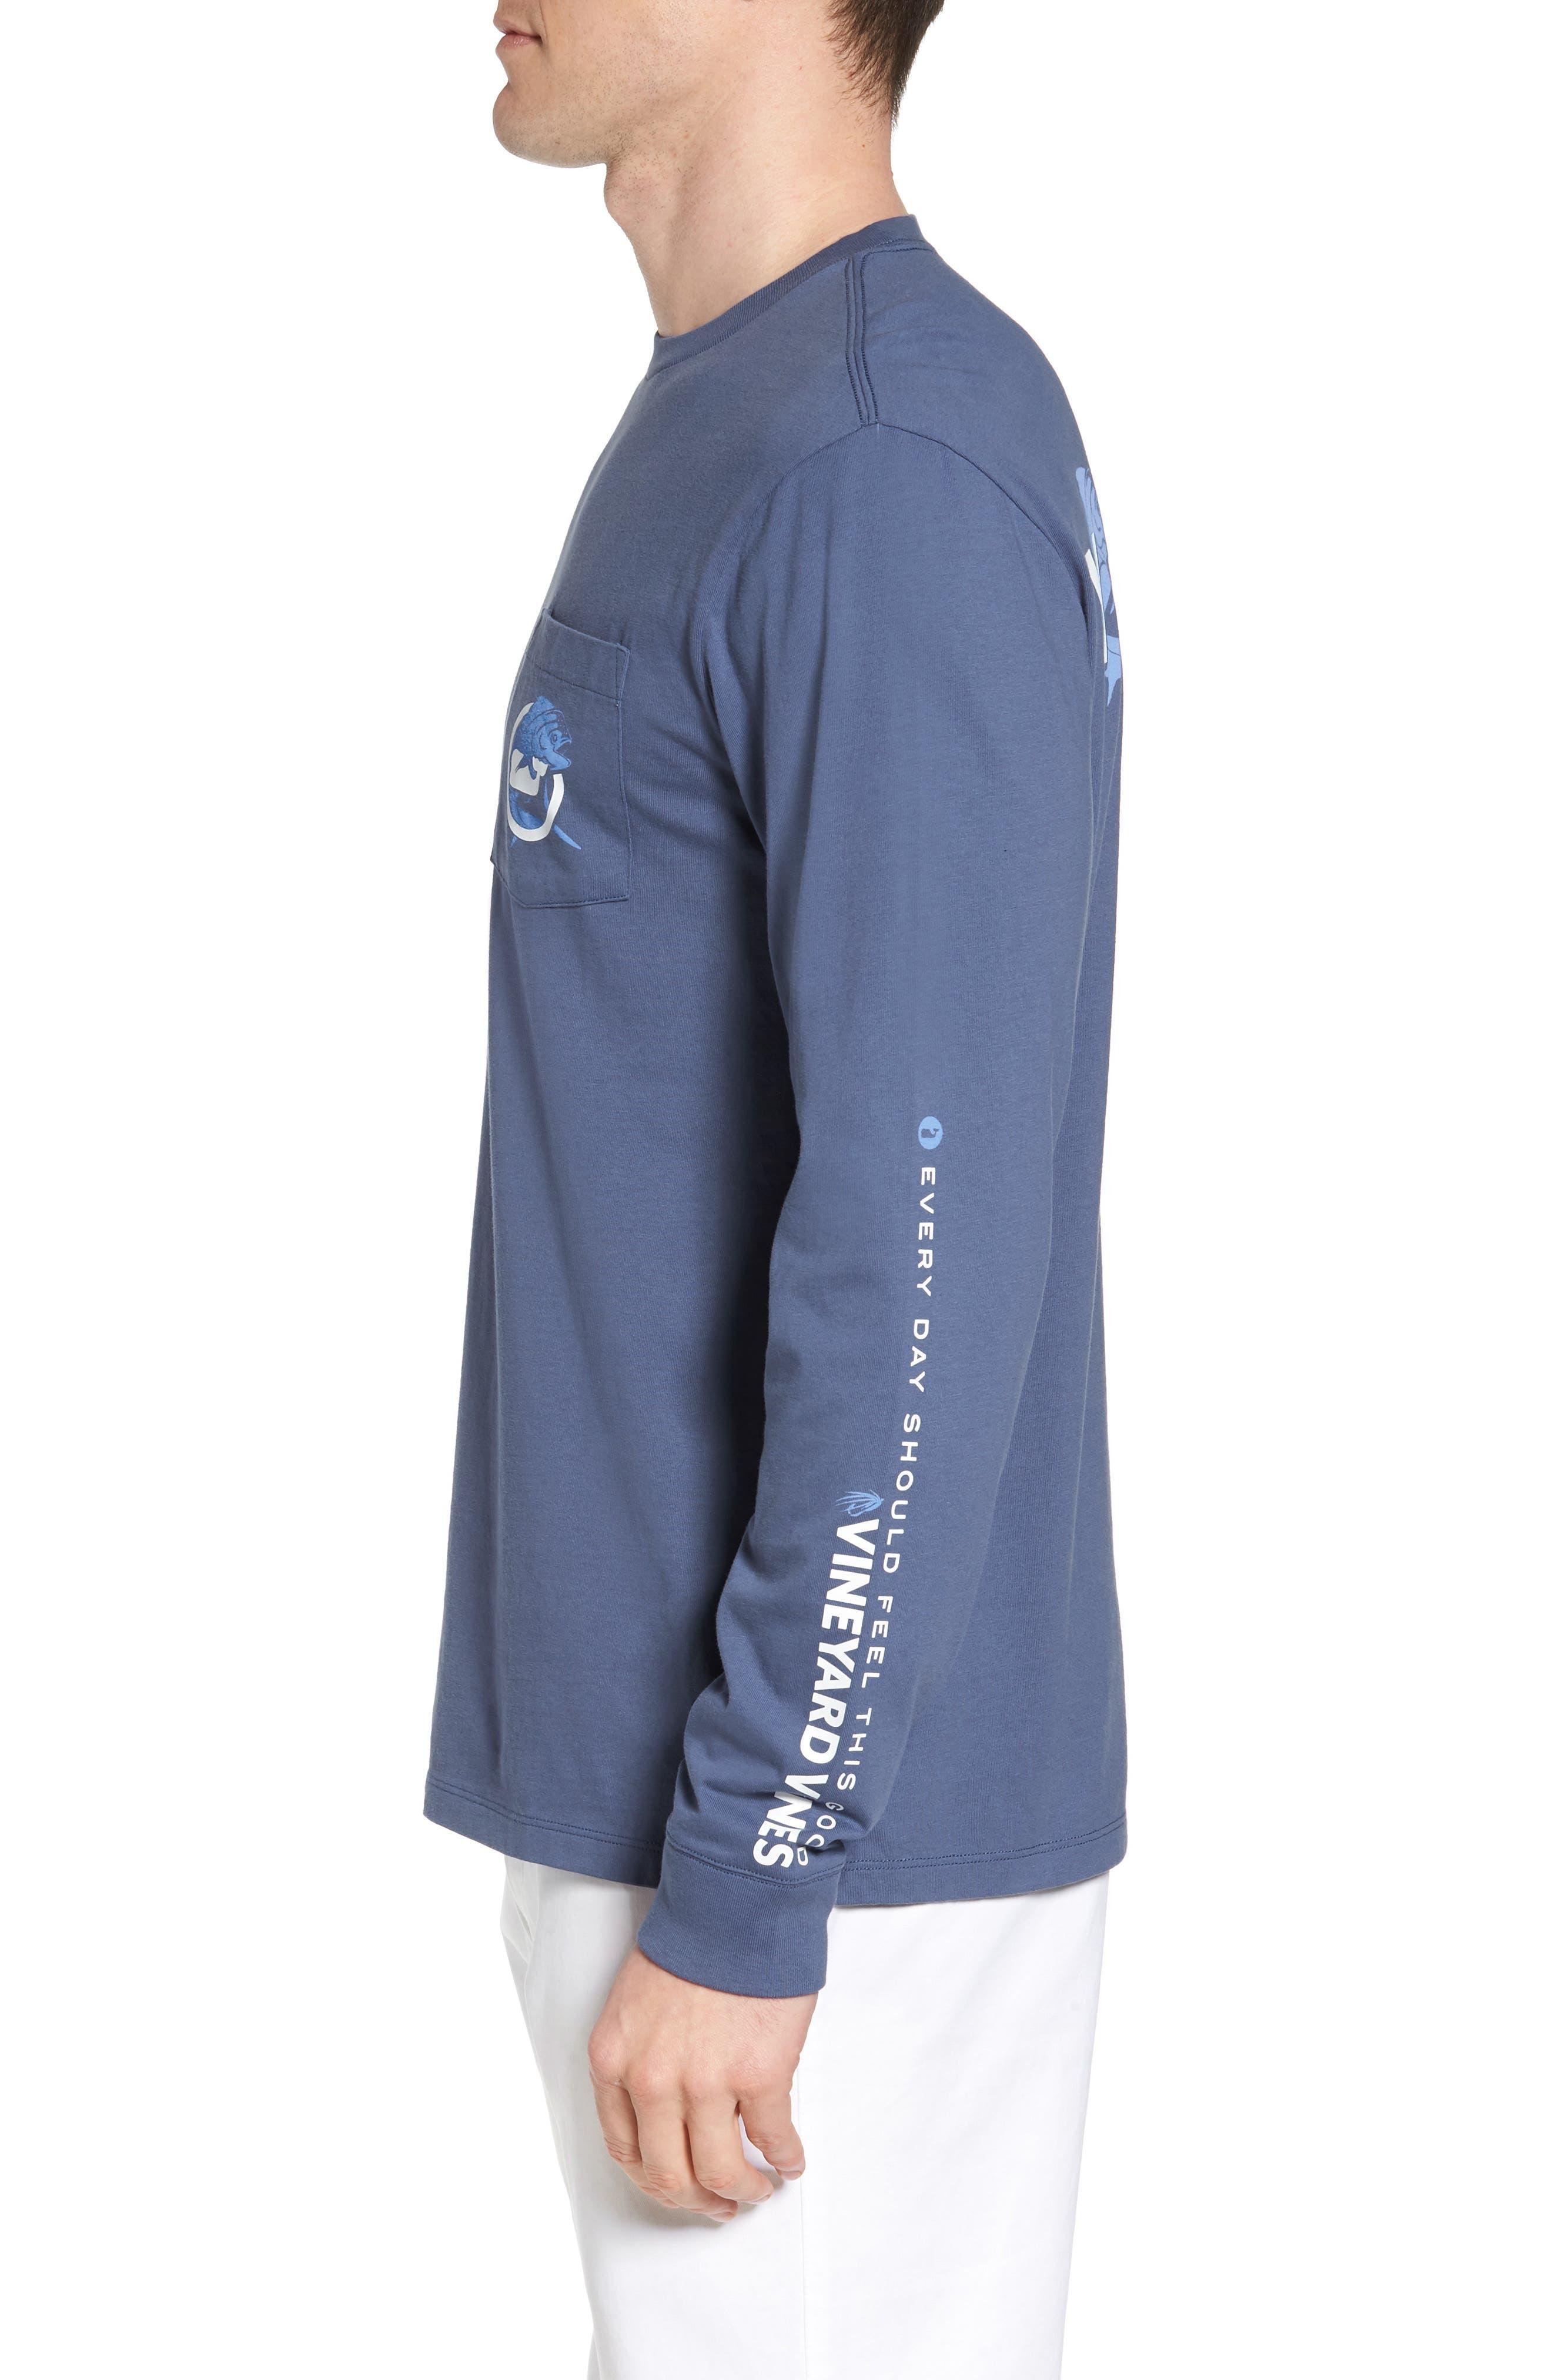 Mahi Long Sleeve T-Shirt,                             Alternate thumbnail 3, color,                             461